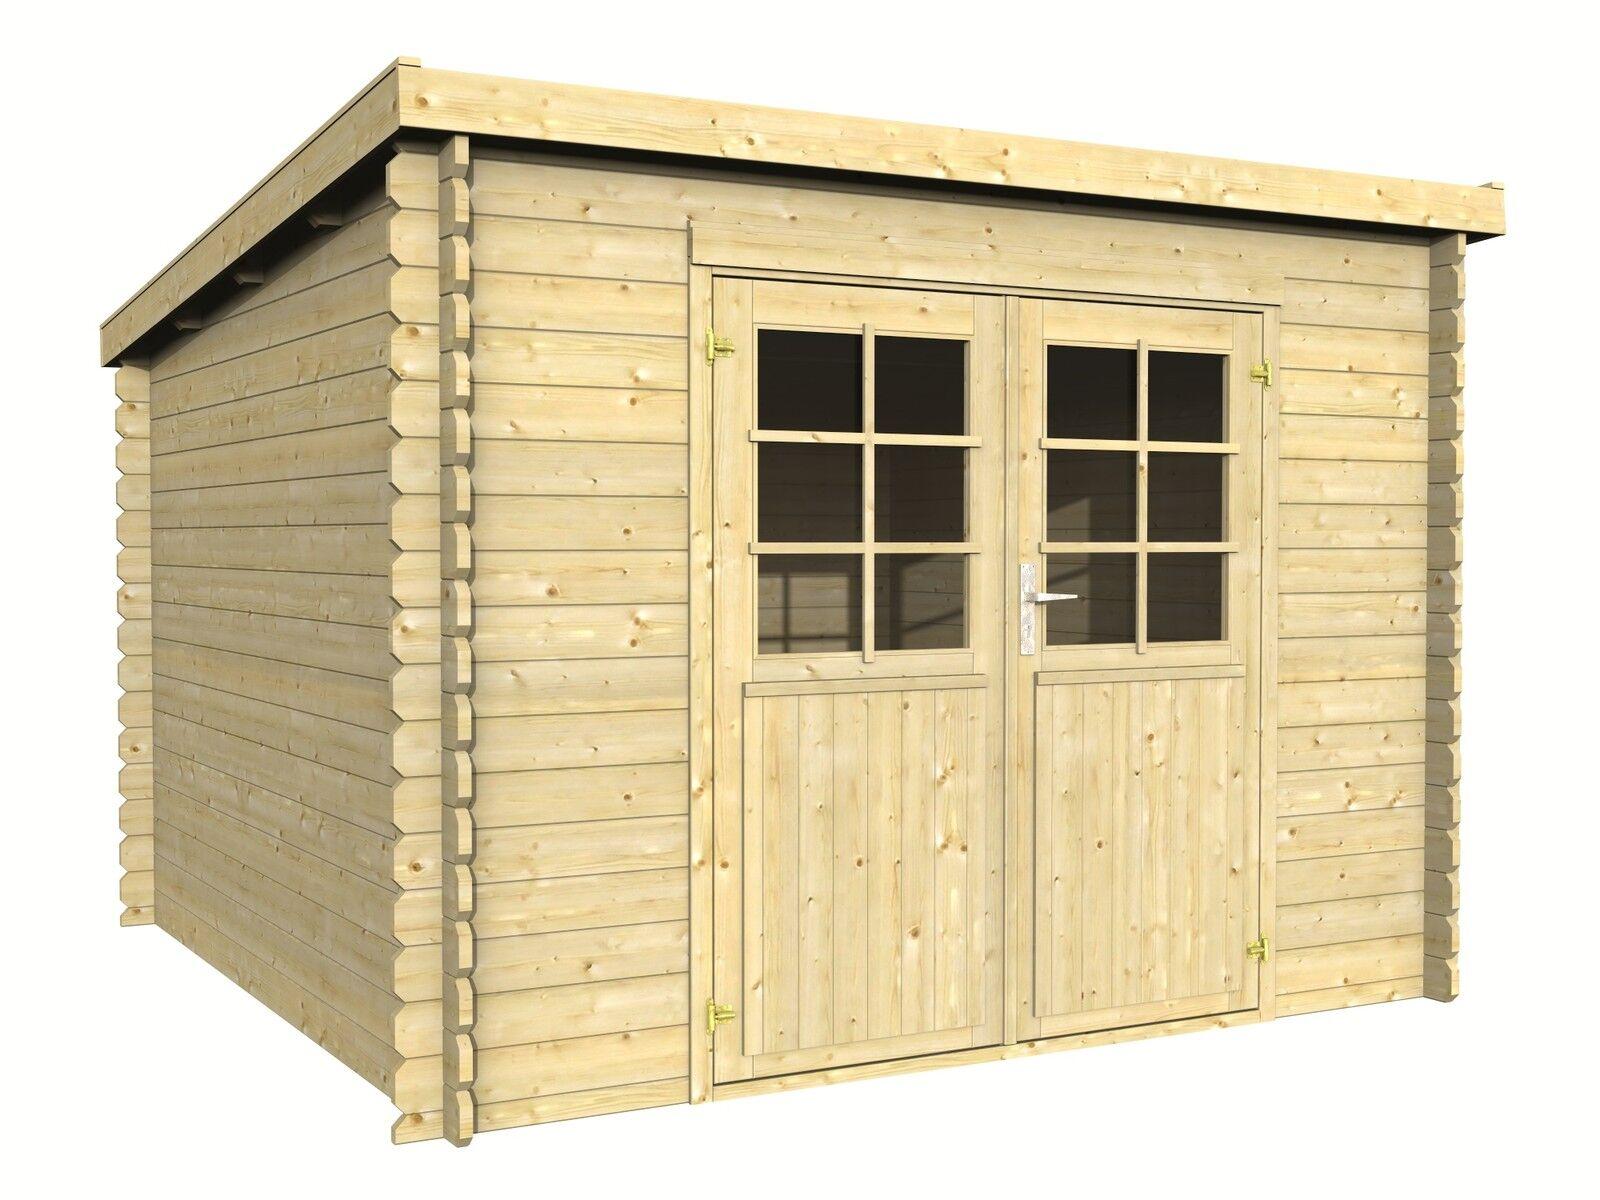 28 mm gartenhaus luna 300x300 cm ger tehaus holz holzhaus schuppen blockhaus ebay. Black Bedroom Furniture Sets. Home Design Ideas